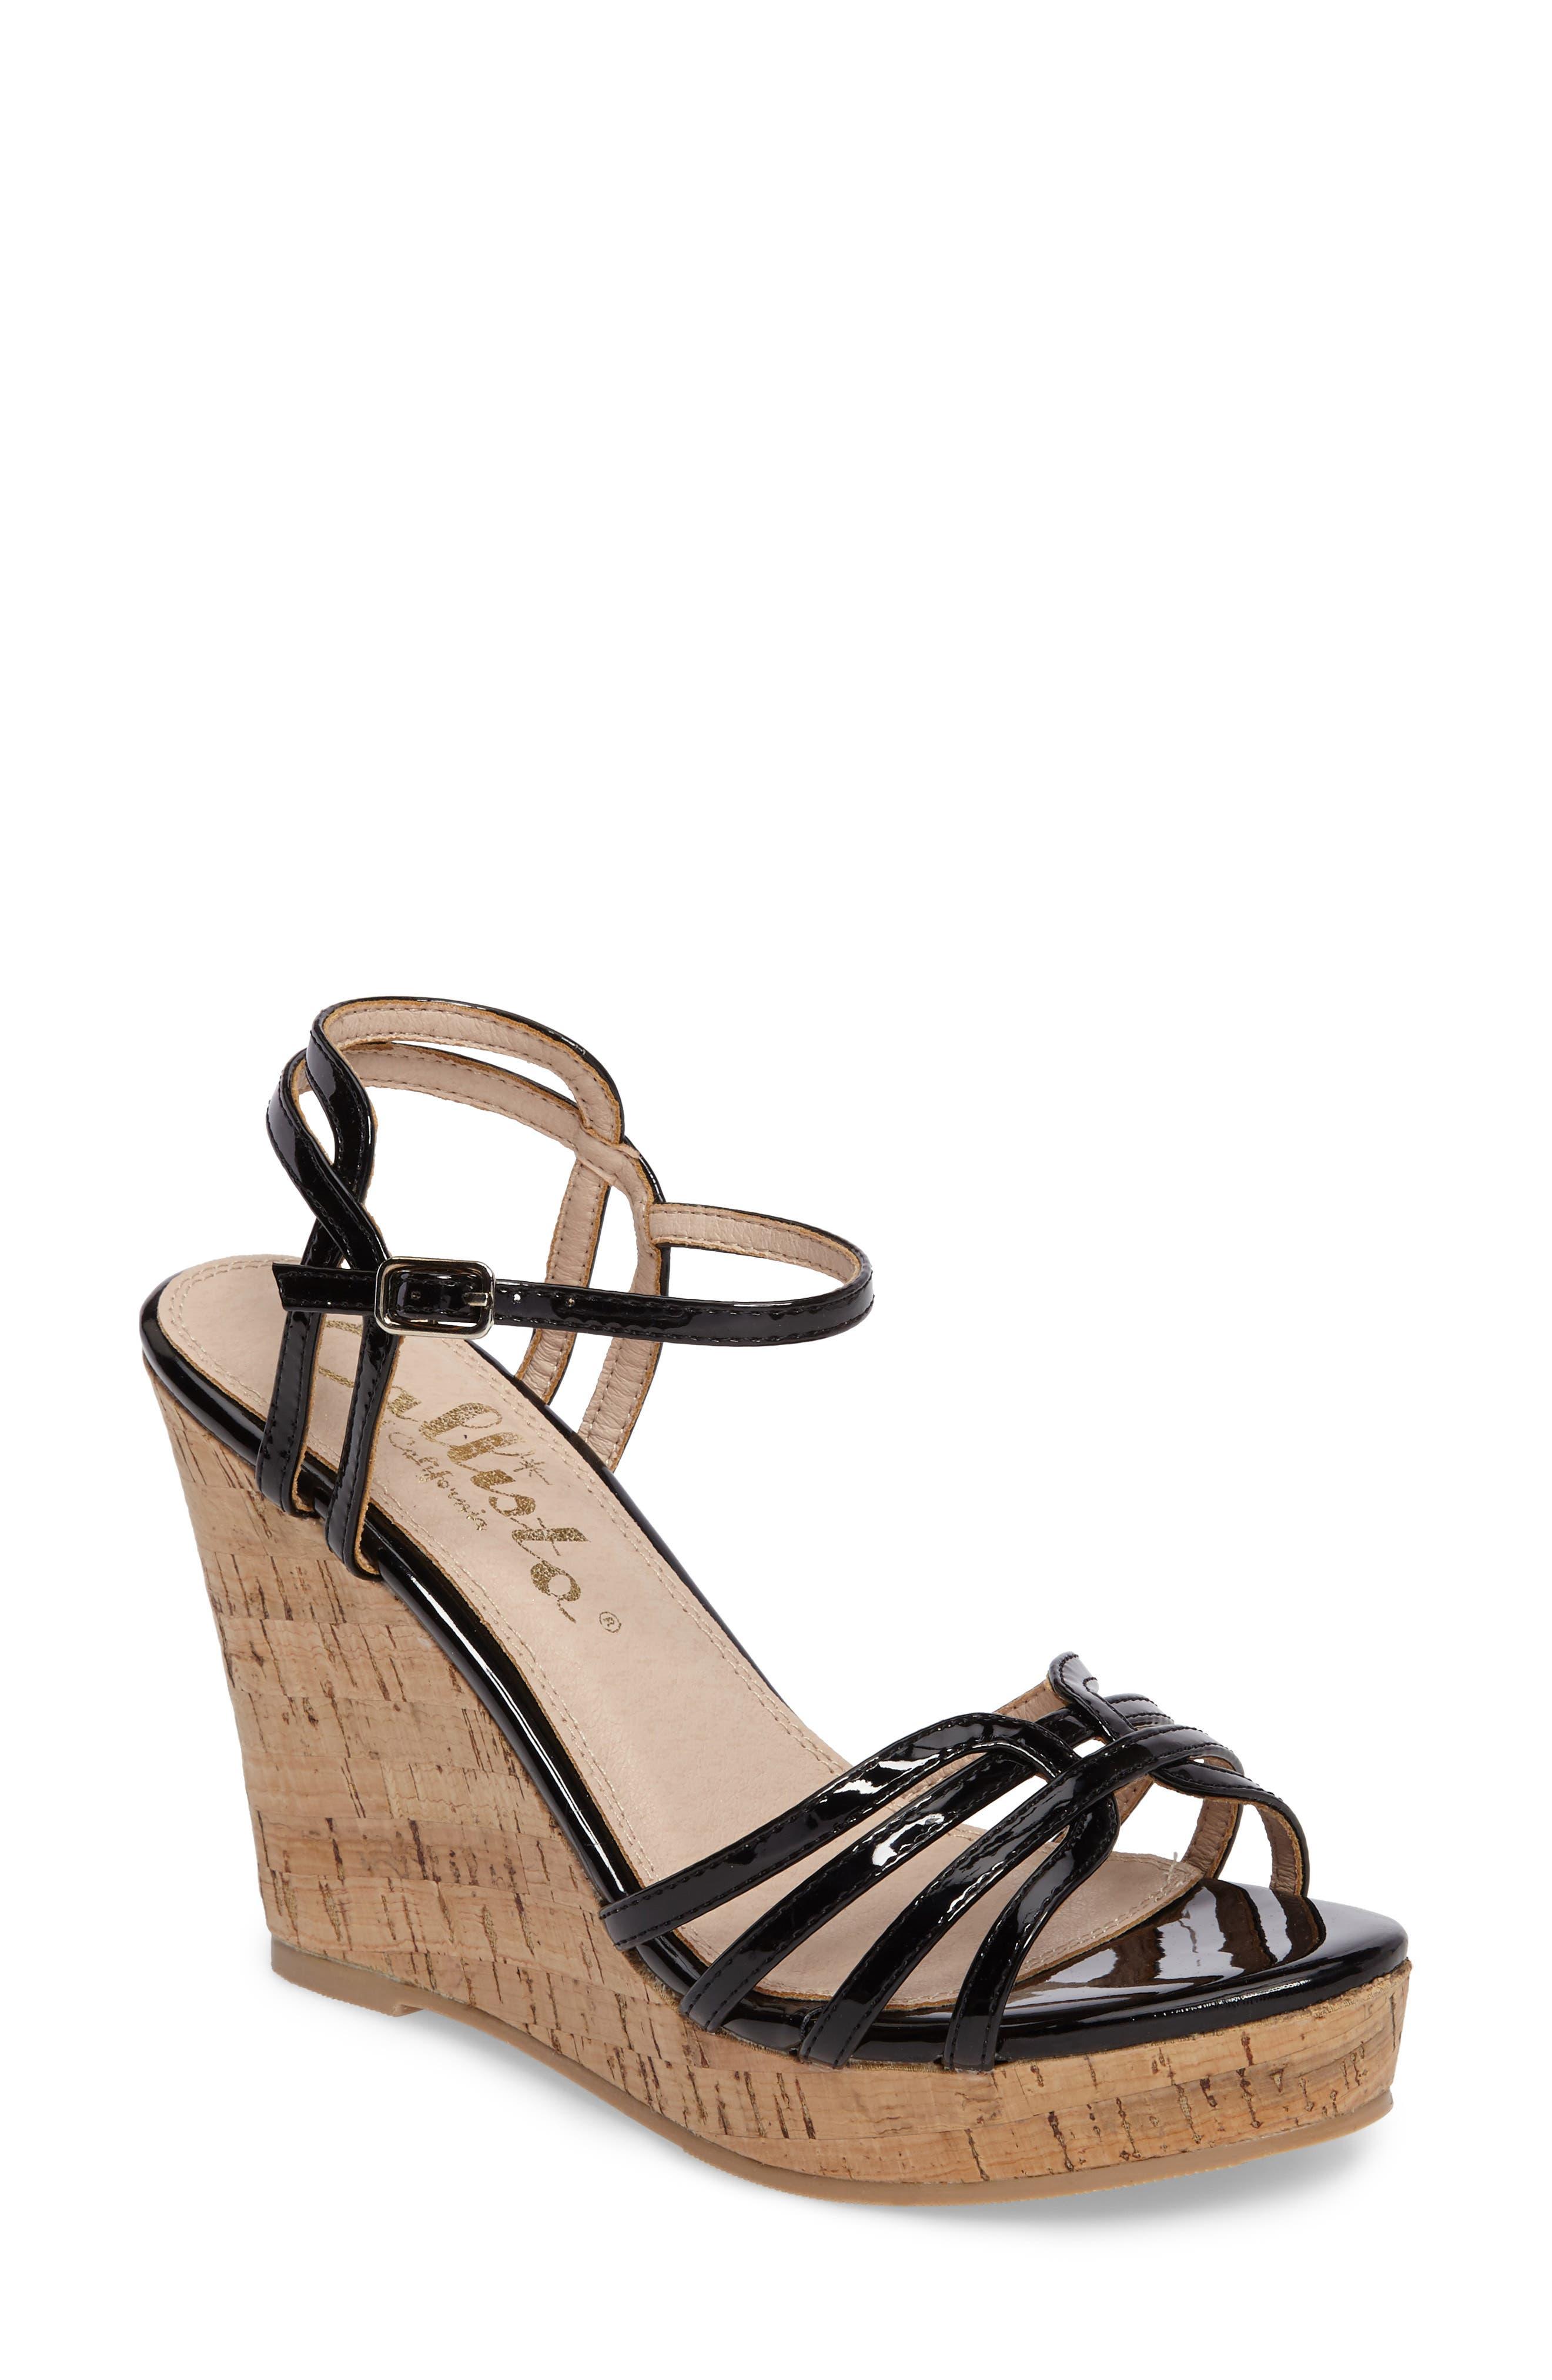 Oasis Platform Wedge Sandal,                             Main thumbnail 1, color,                             BLACK SYNTHETIC